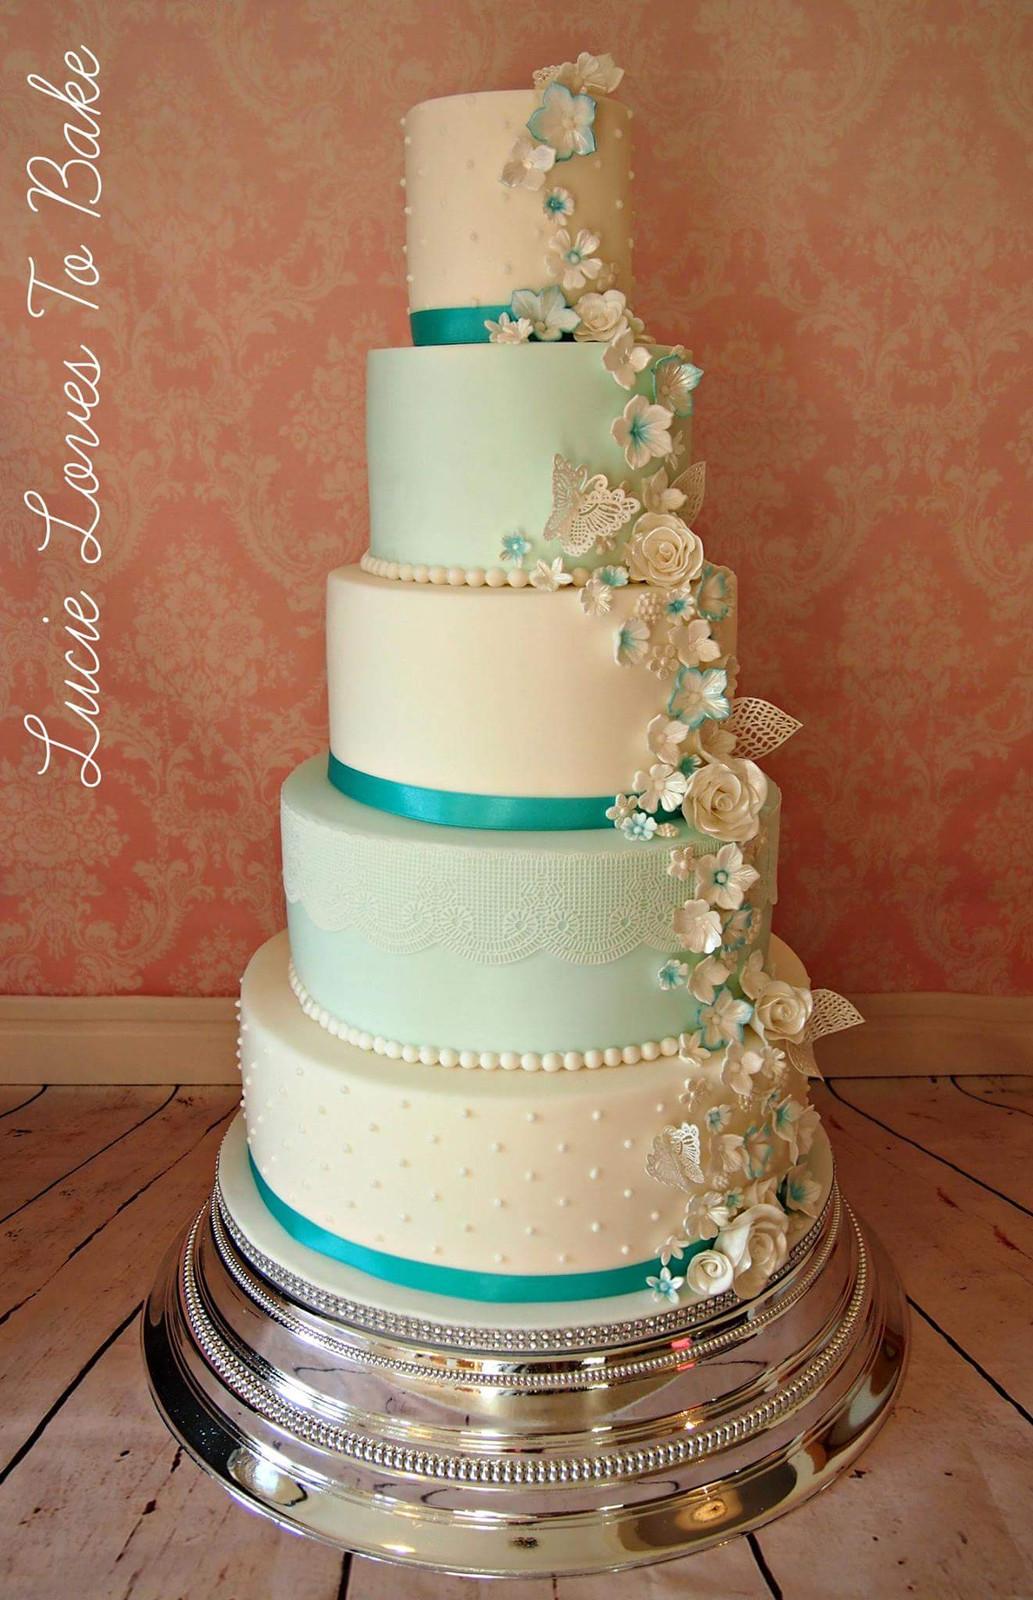 Wedding Cake Photo Gallery Dorset Hampshire Lucie Loves To Bake